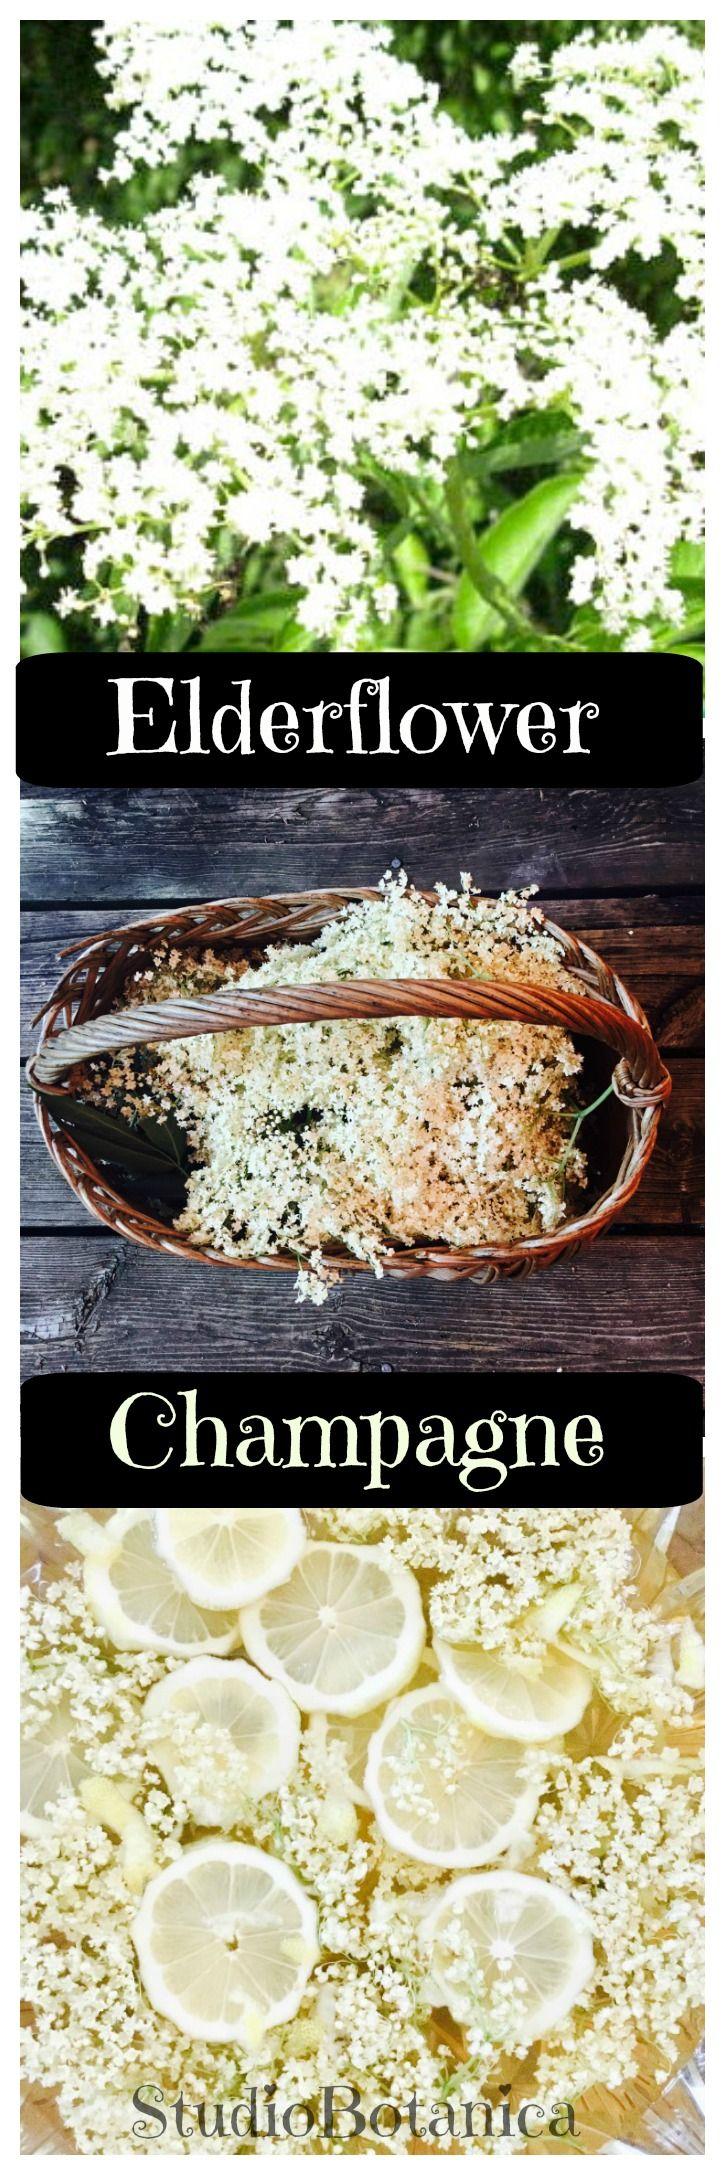 Make this delightful Elderflower Champagne or 'fizz'! Easy recipe. Delicious and 'kid-friendly'. Enjoy the benefits of Elderflower!